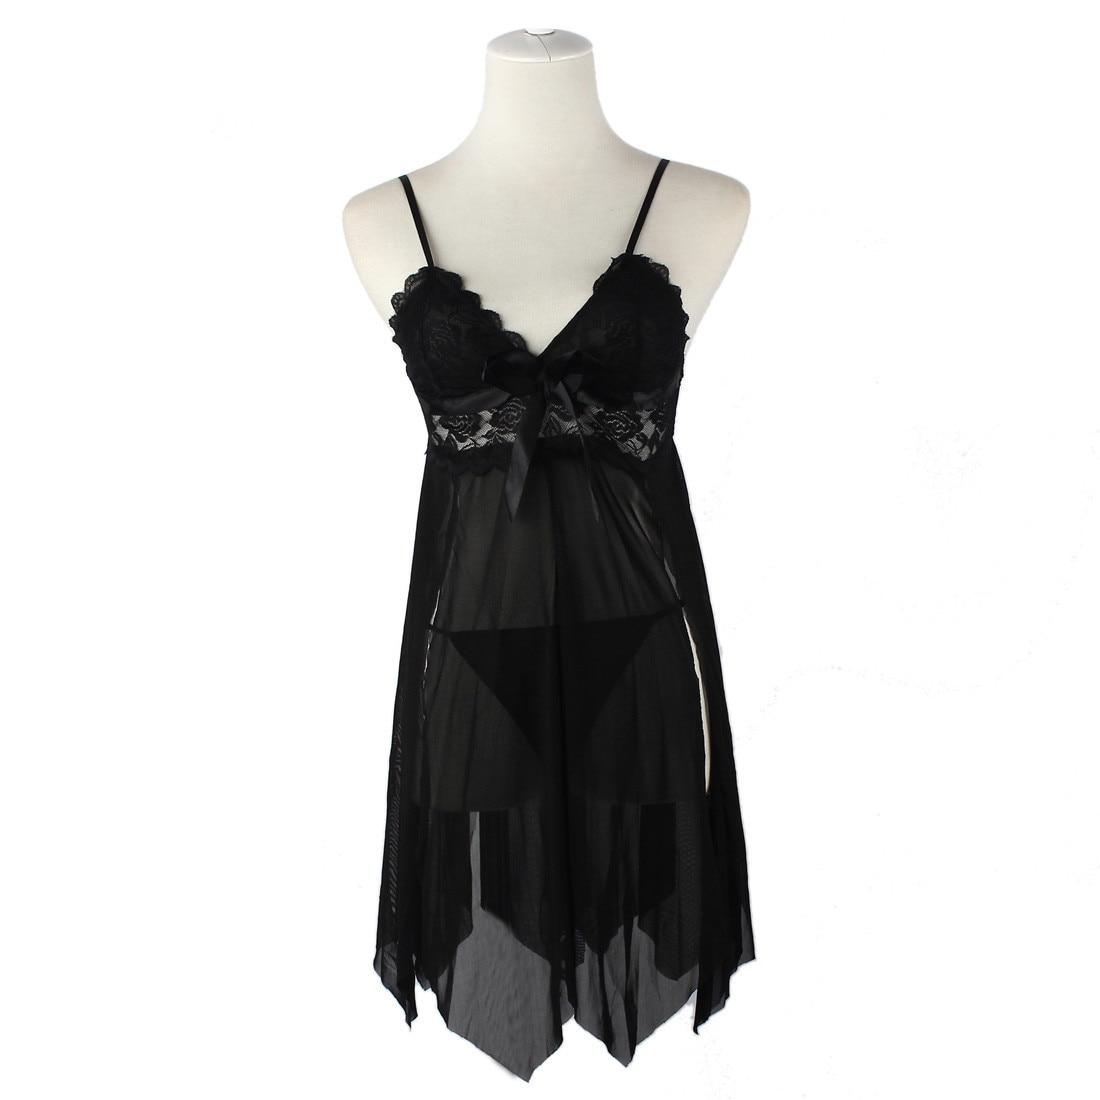 Lingerie Sexy Lingerie Sleep Tops Women Underwear Sleepwear Lace Dress G-string Nightwear Erotic Lingerie эротическое бельё50